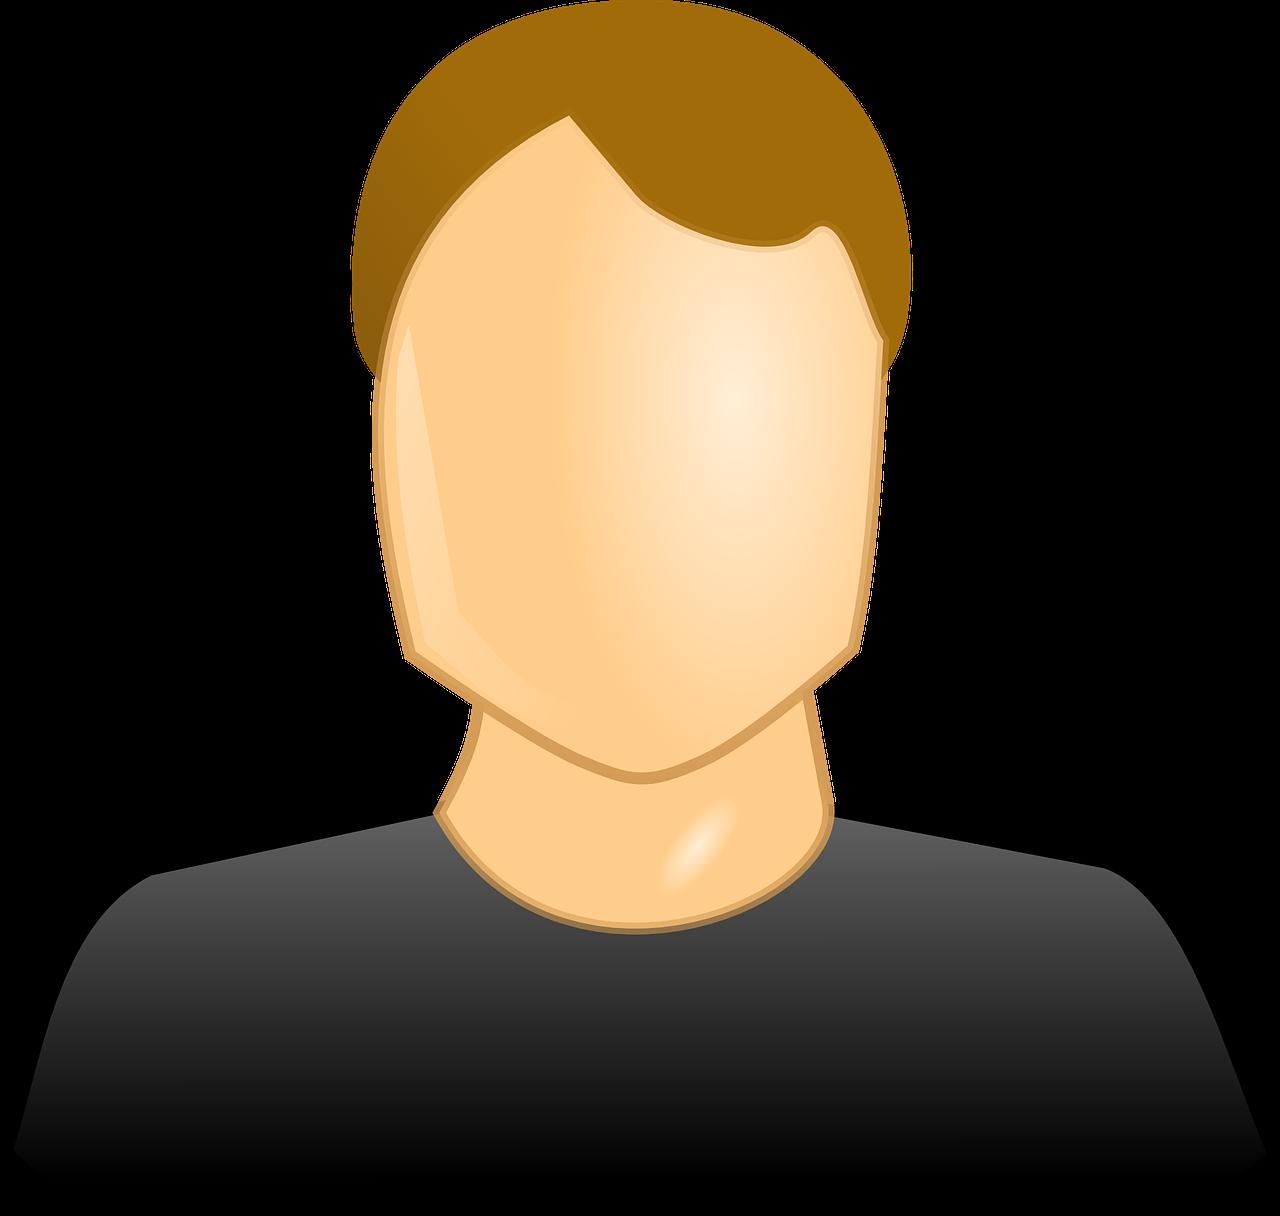 user, man, profile-33638.jpg